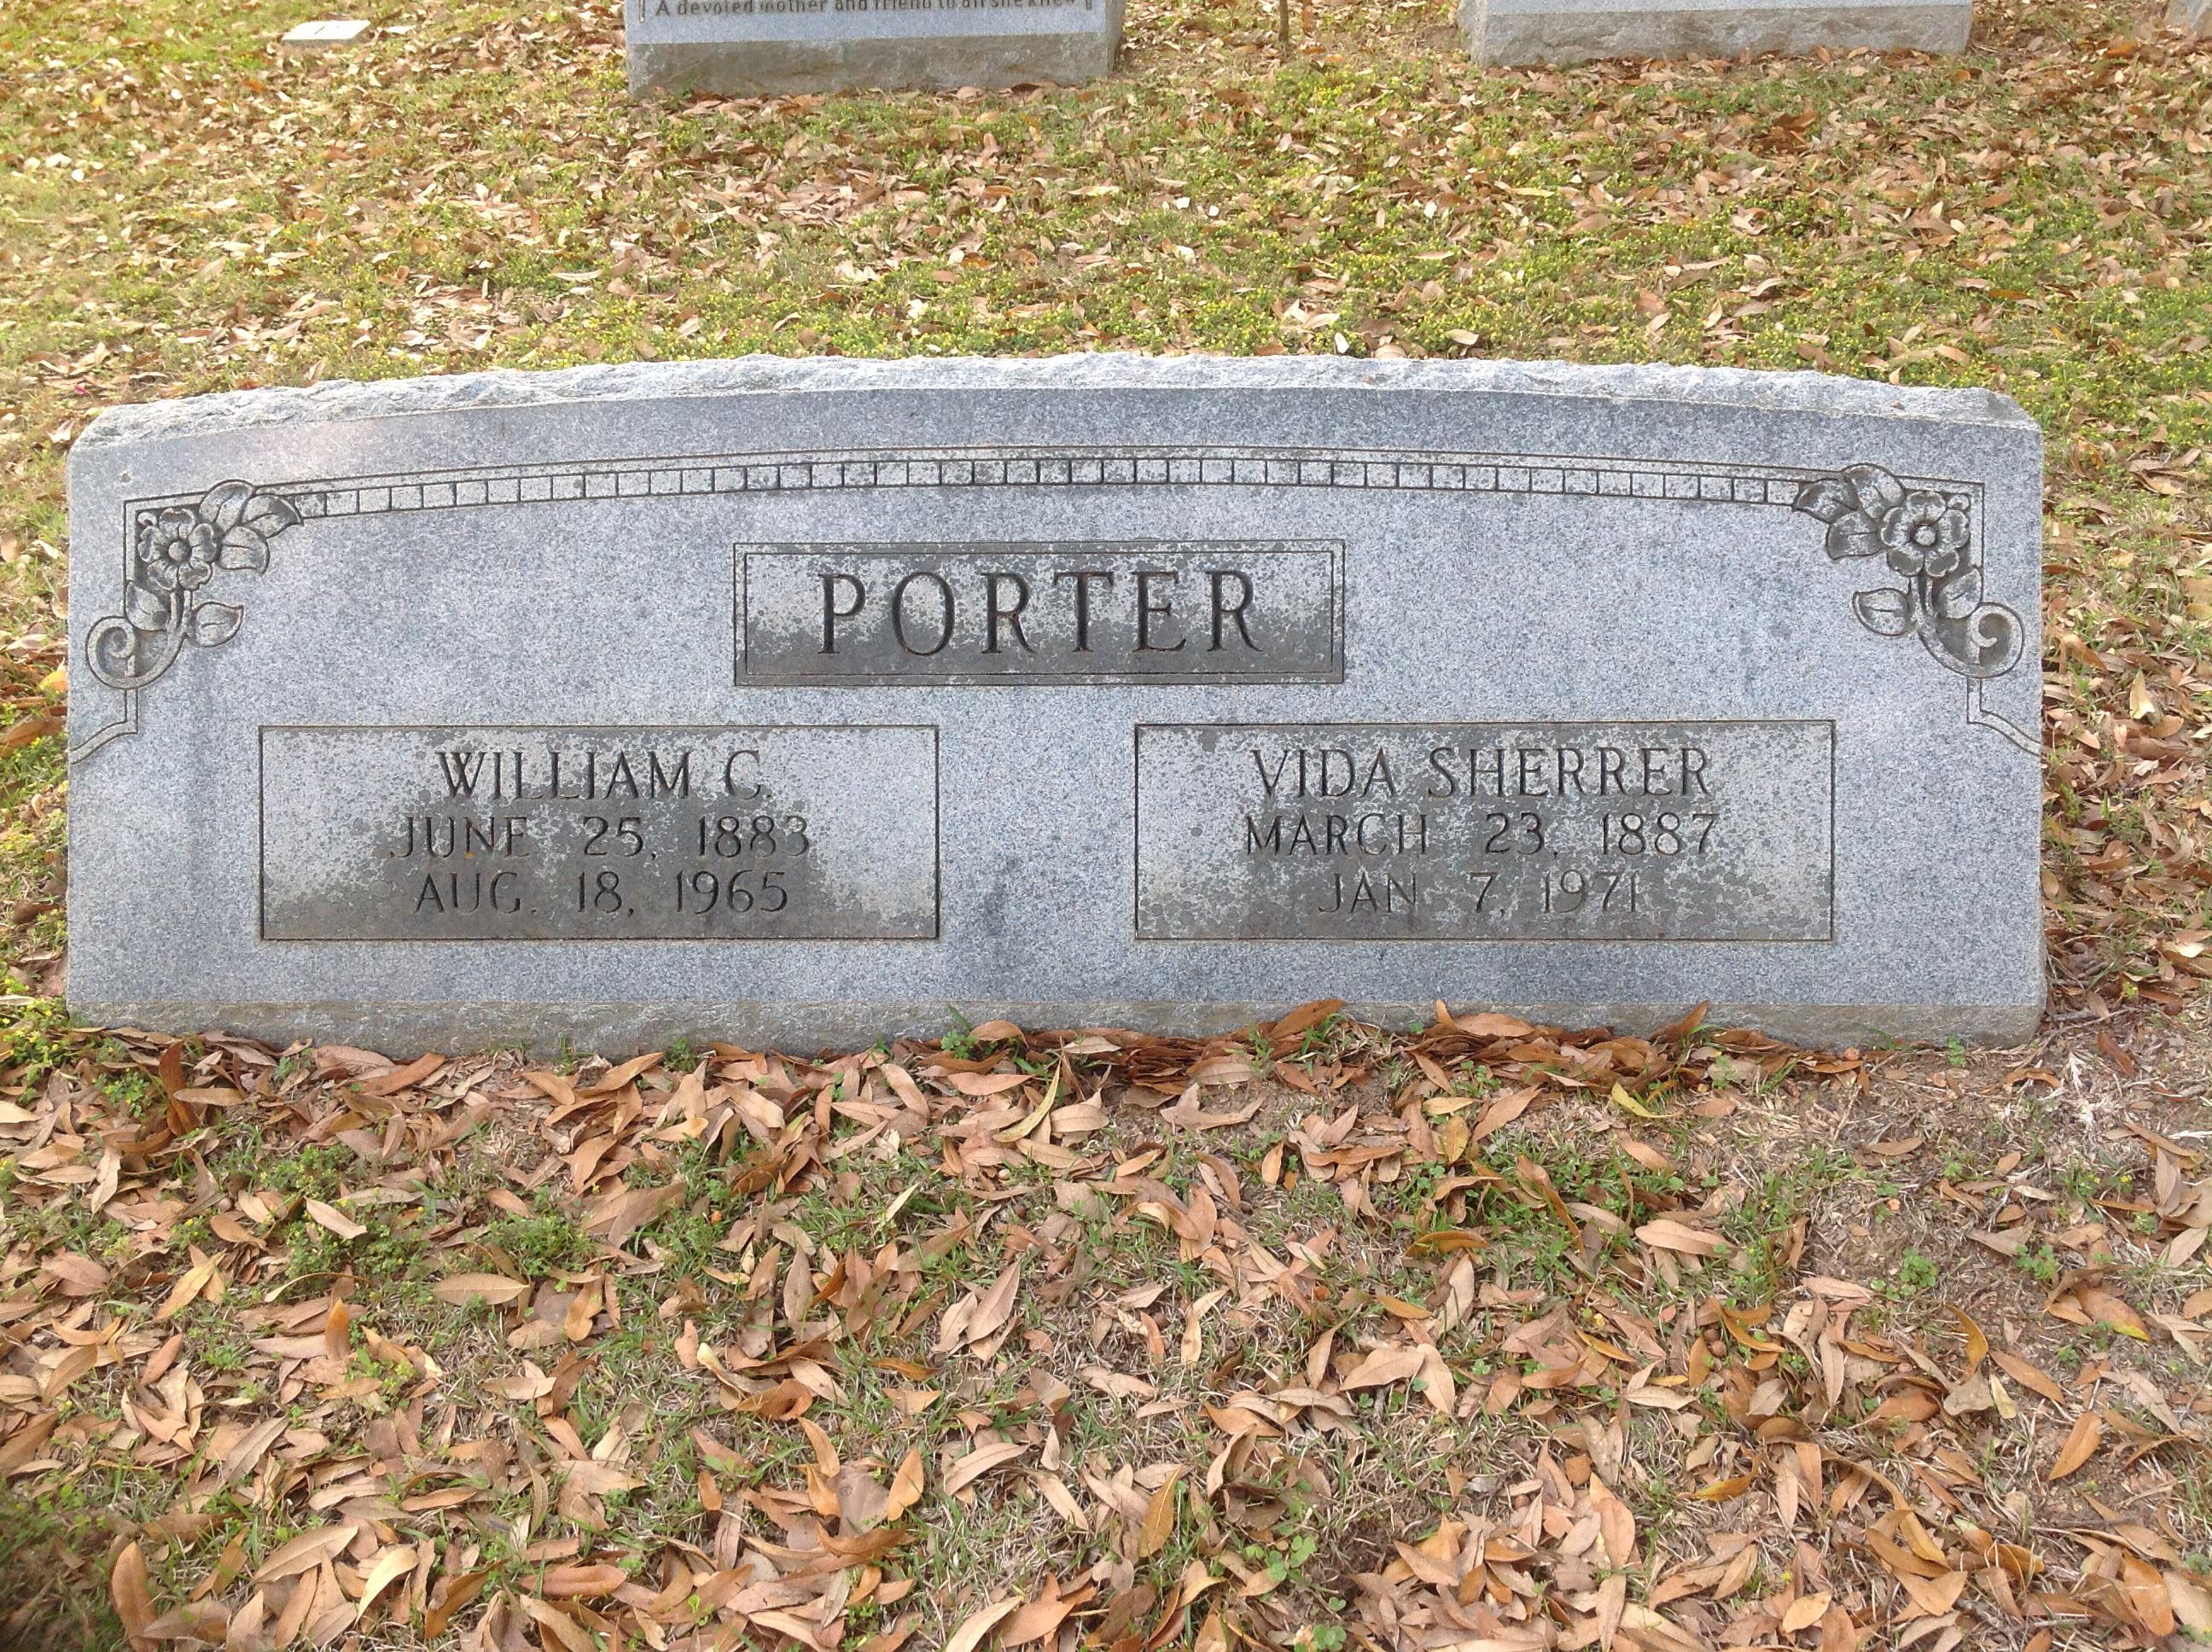 William Carothers Porter